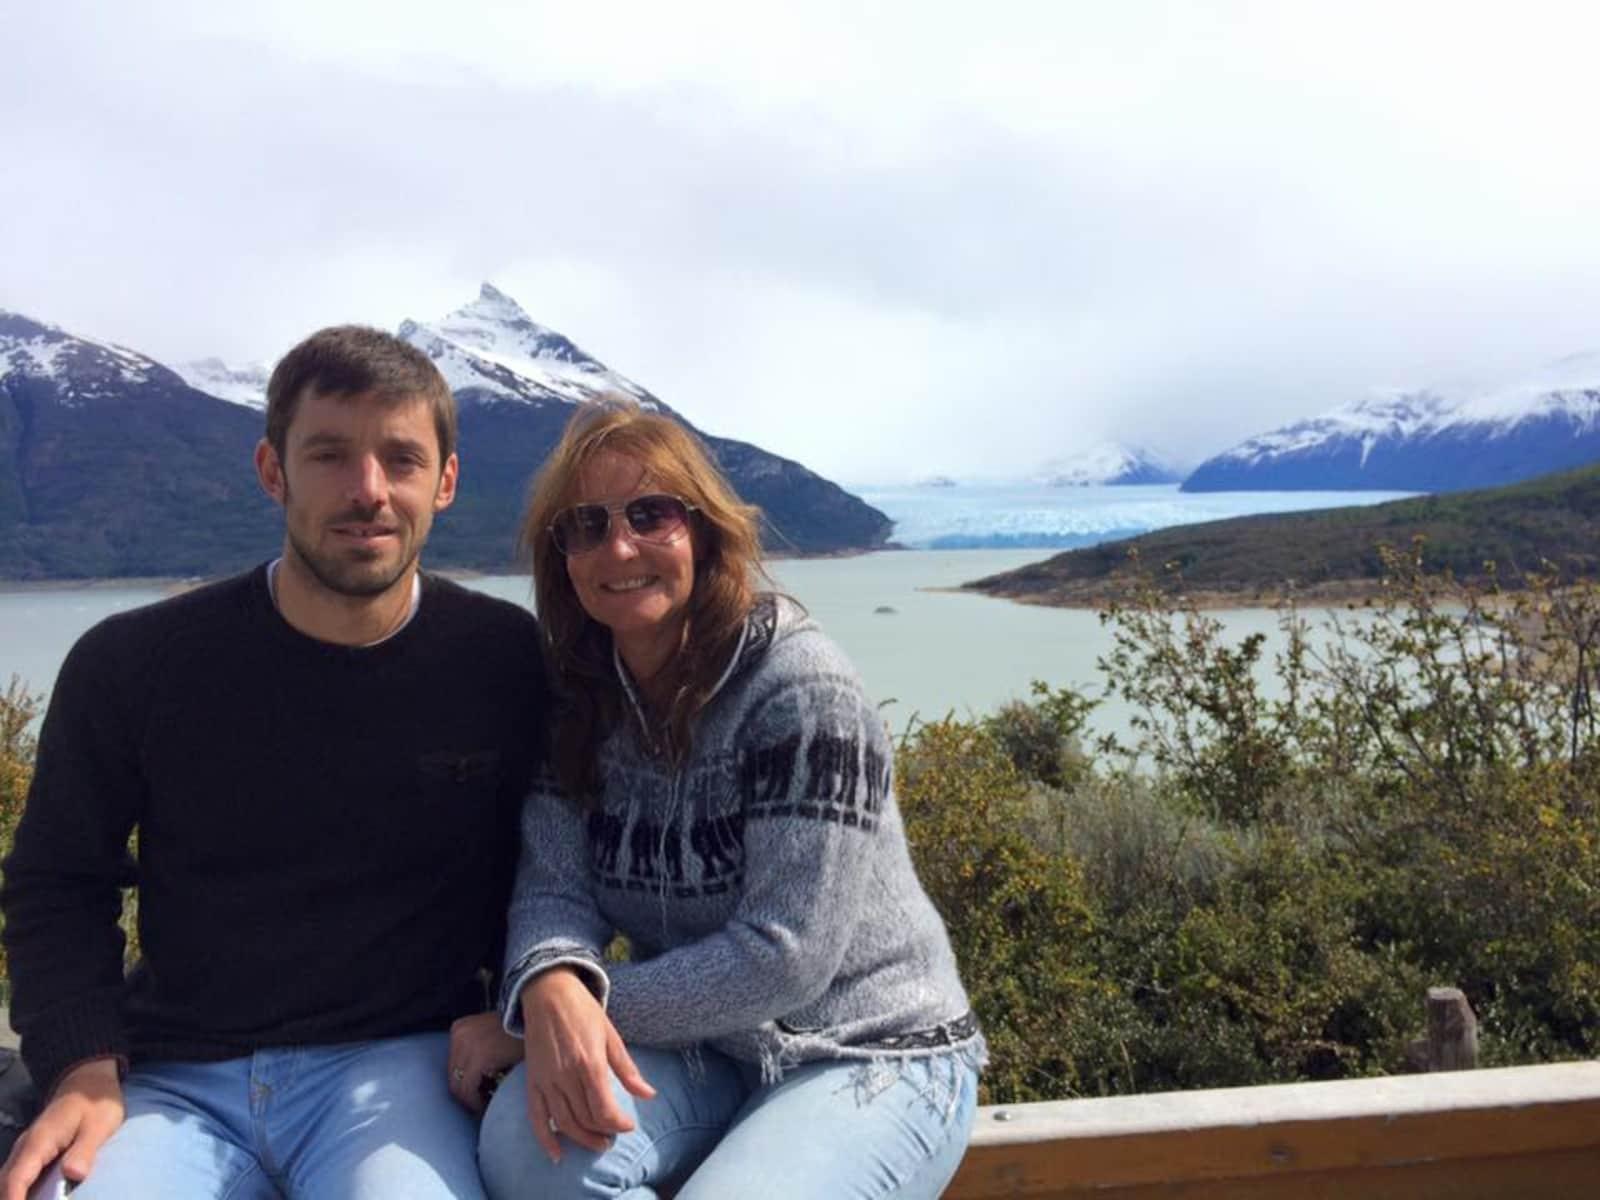 Steve & Vanessa from Harrogate, United Kingdom